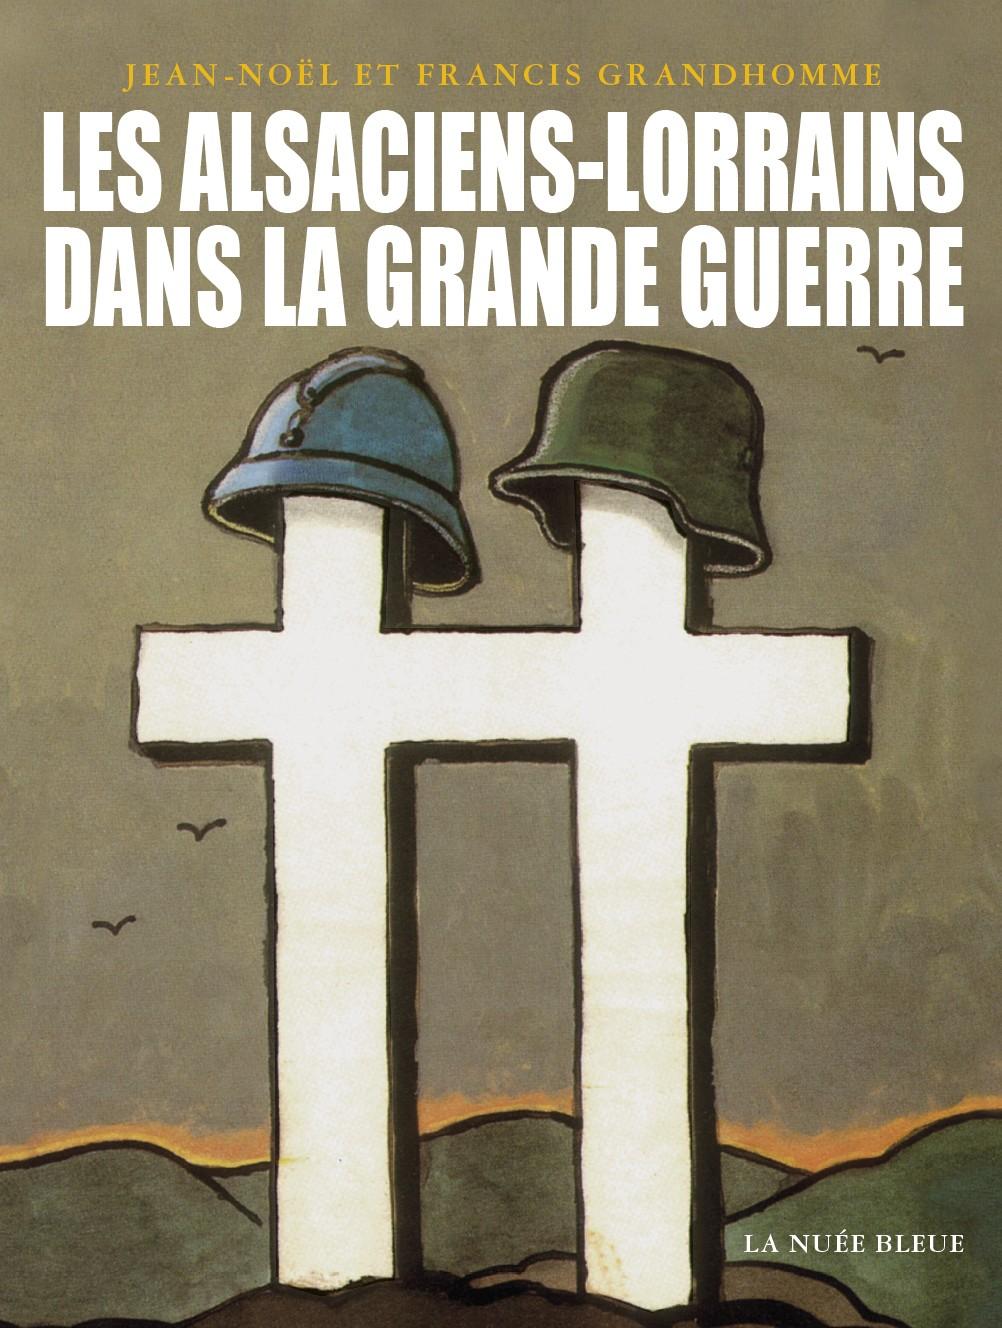 Les Alsaciens-Lorrains dans la Grande Guerre